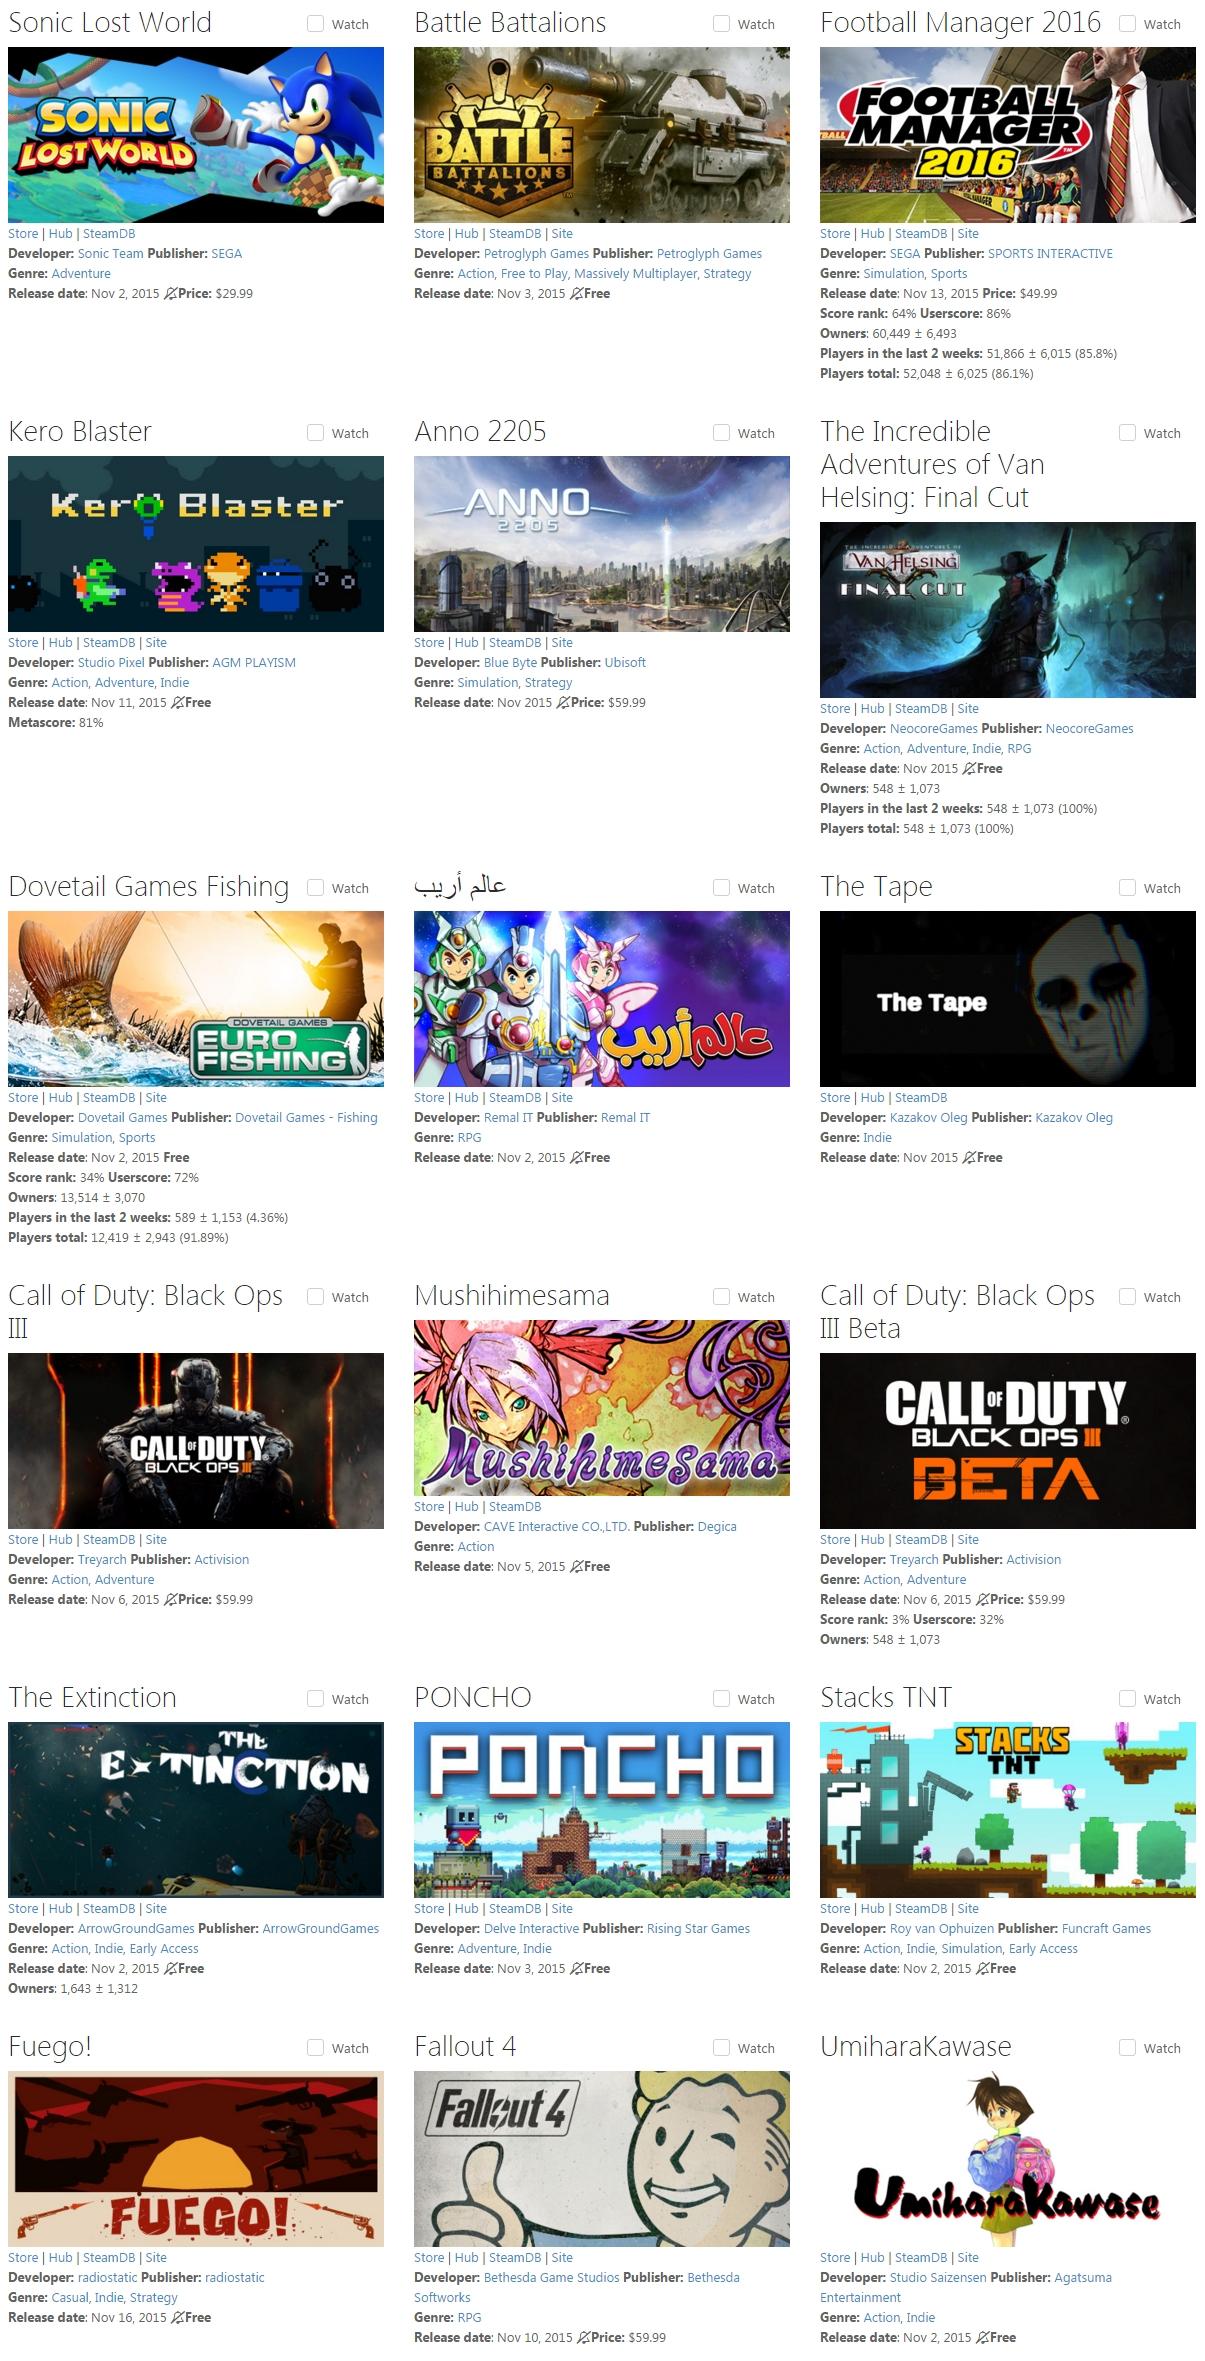 'SteamSpy - All the data and stats about Steam games' - steamspy_com_ - 218.jpg